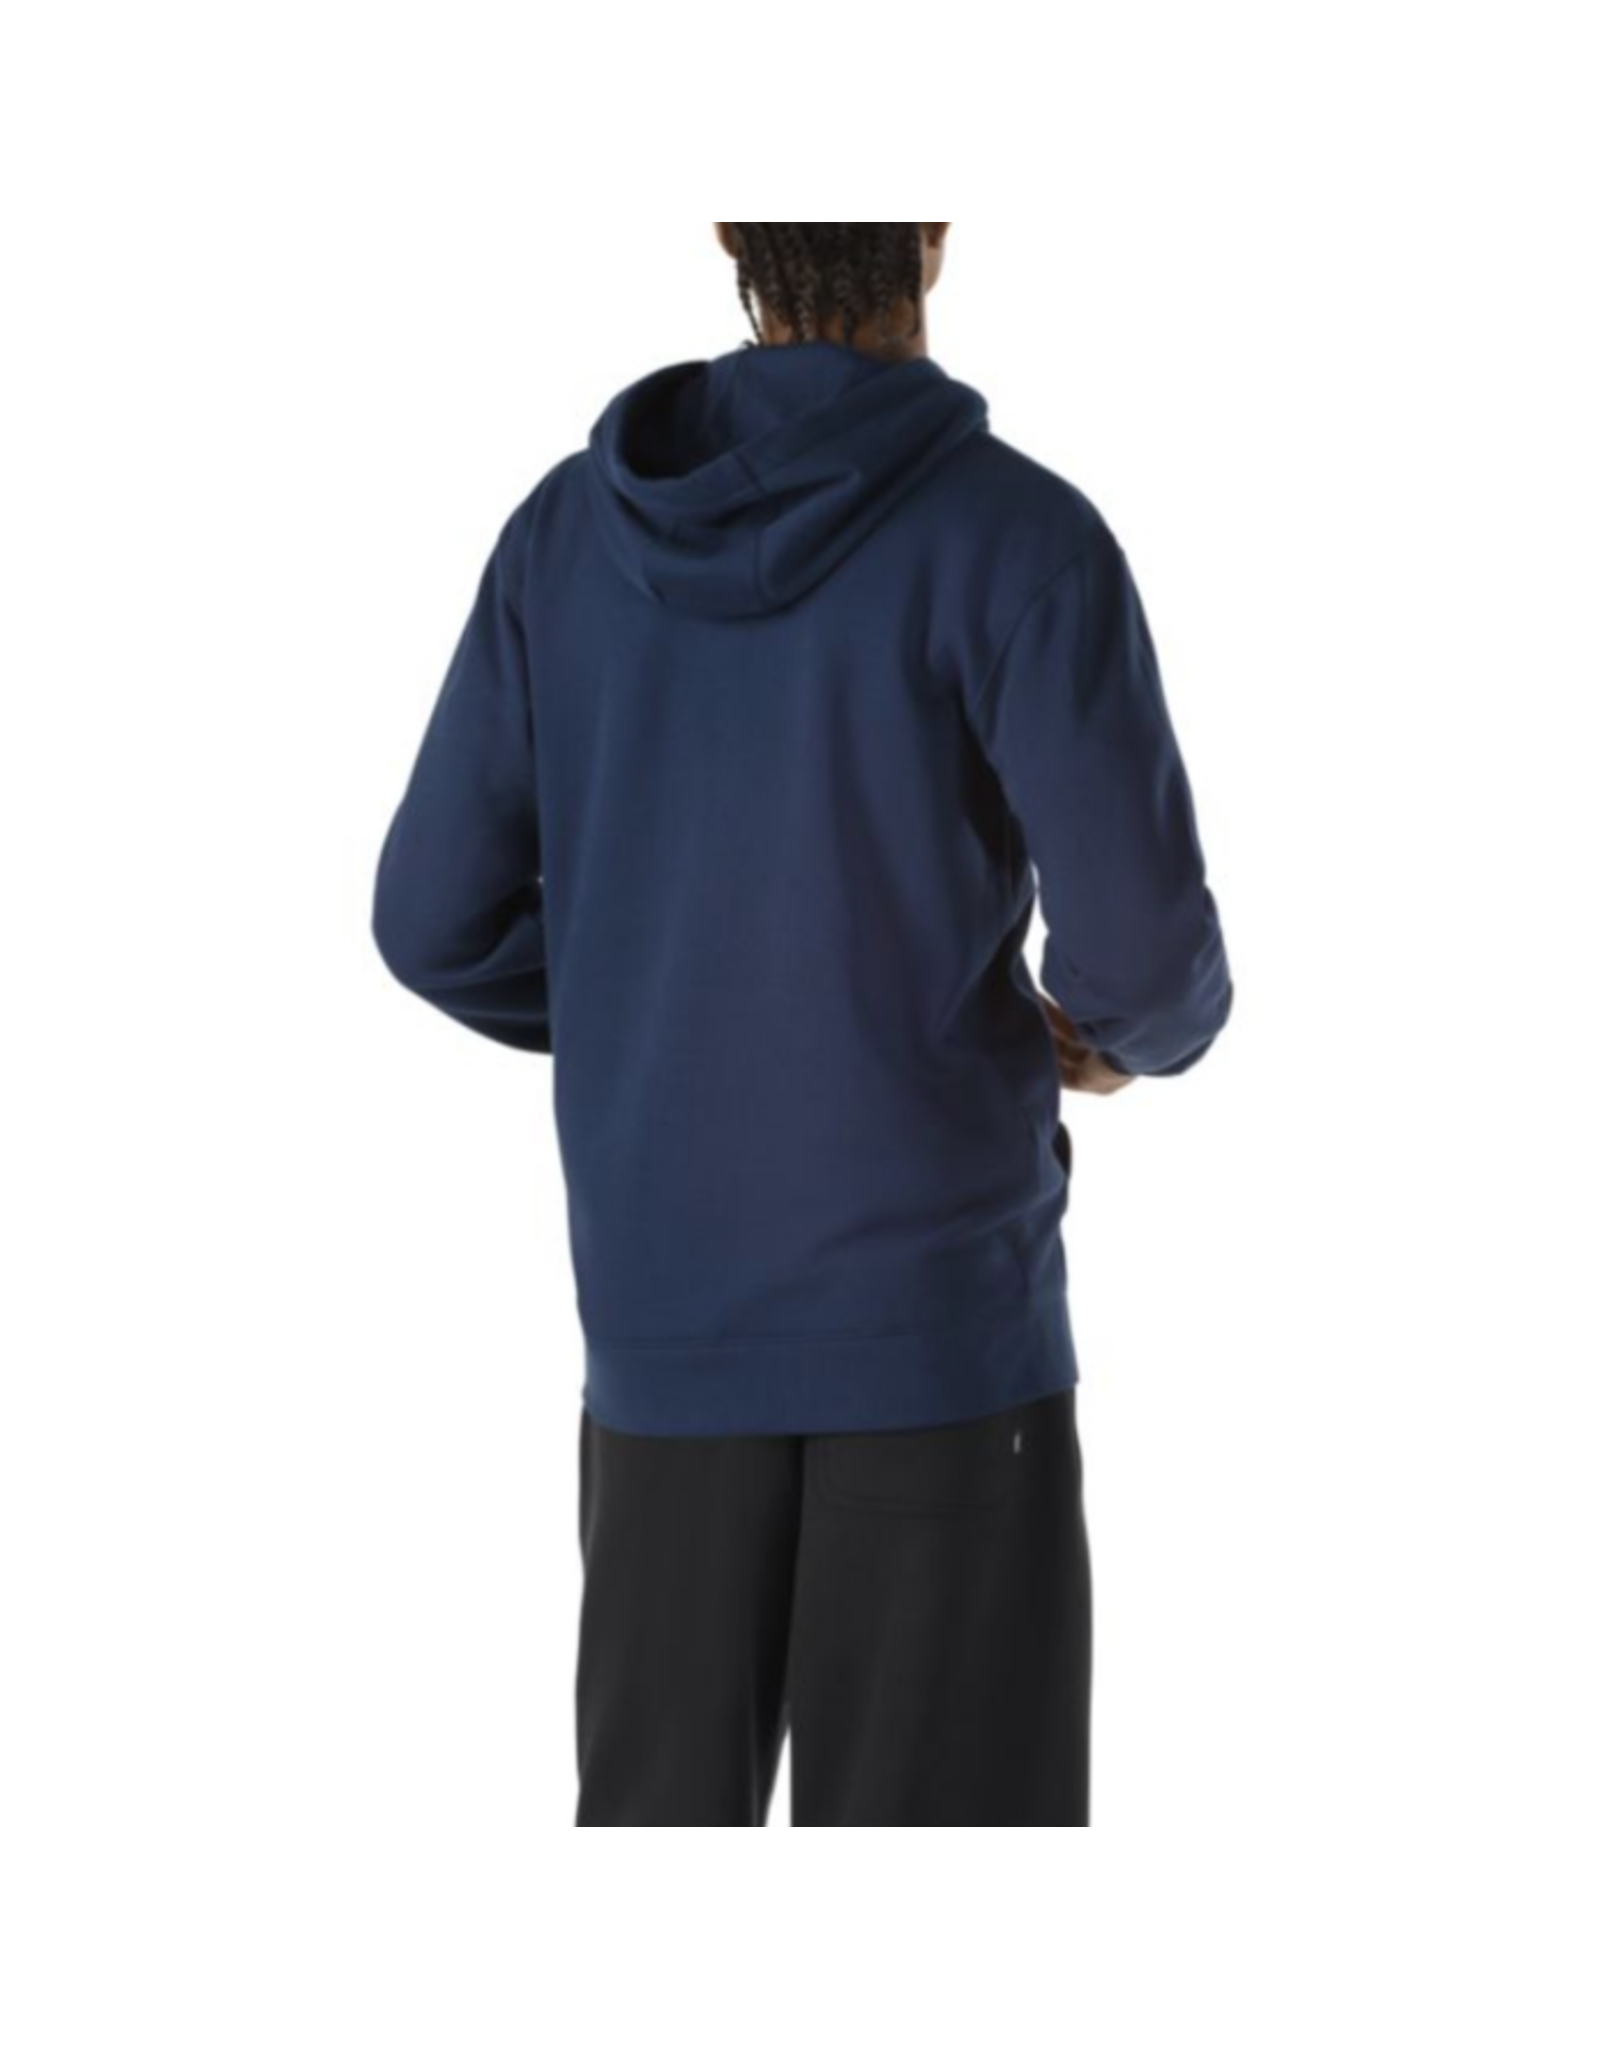 Vans Retro Oval Pullover Hoodie - Dress blue